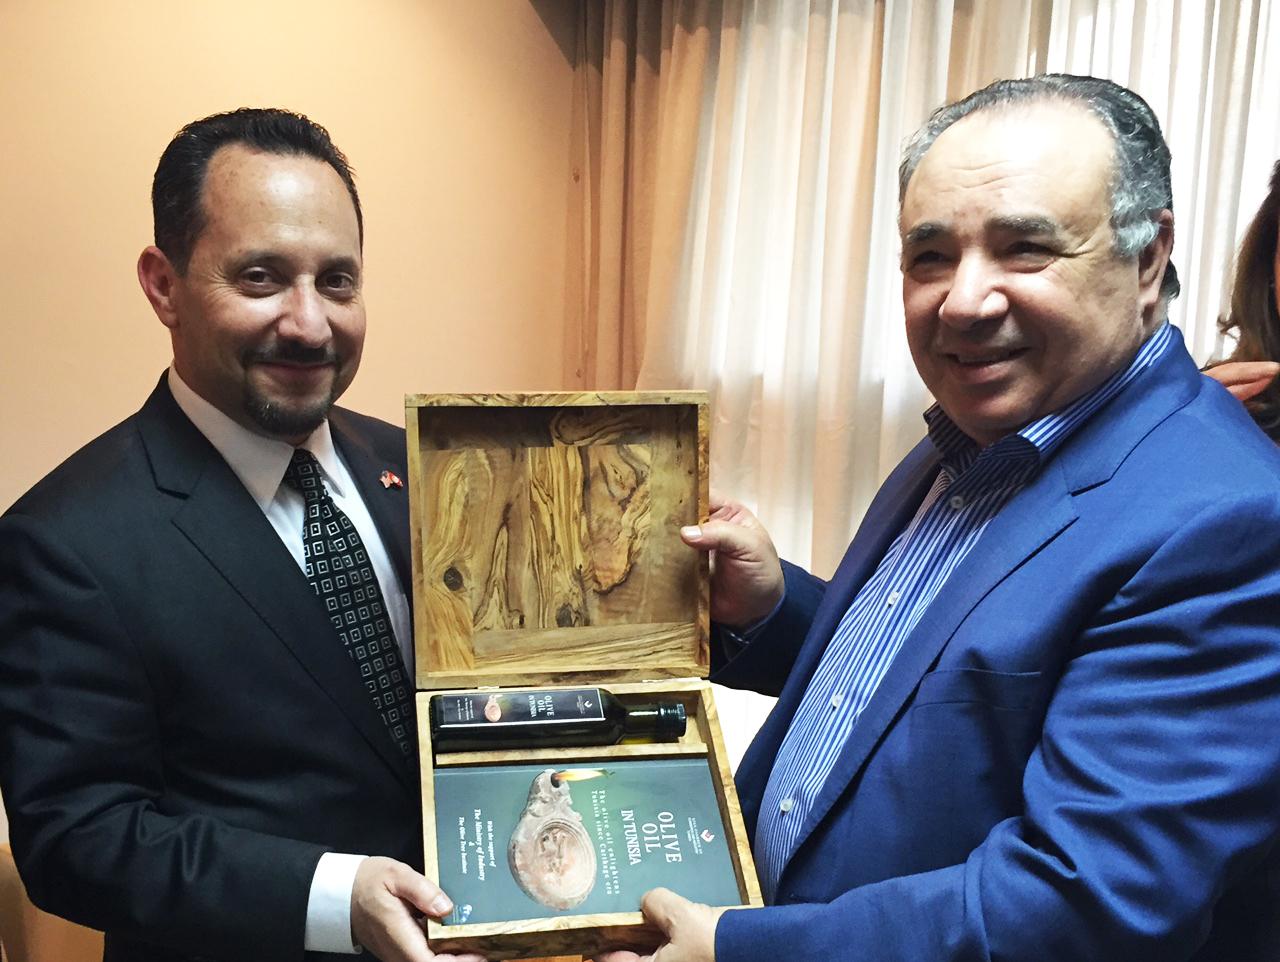 Huile d 39 olive huile d 39 olive tunisie huile d olive en for Chambre de commerce de sfax